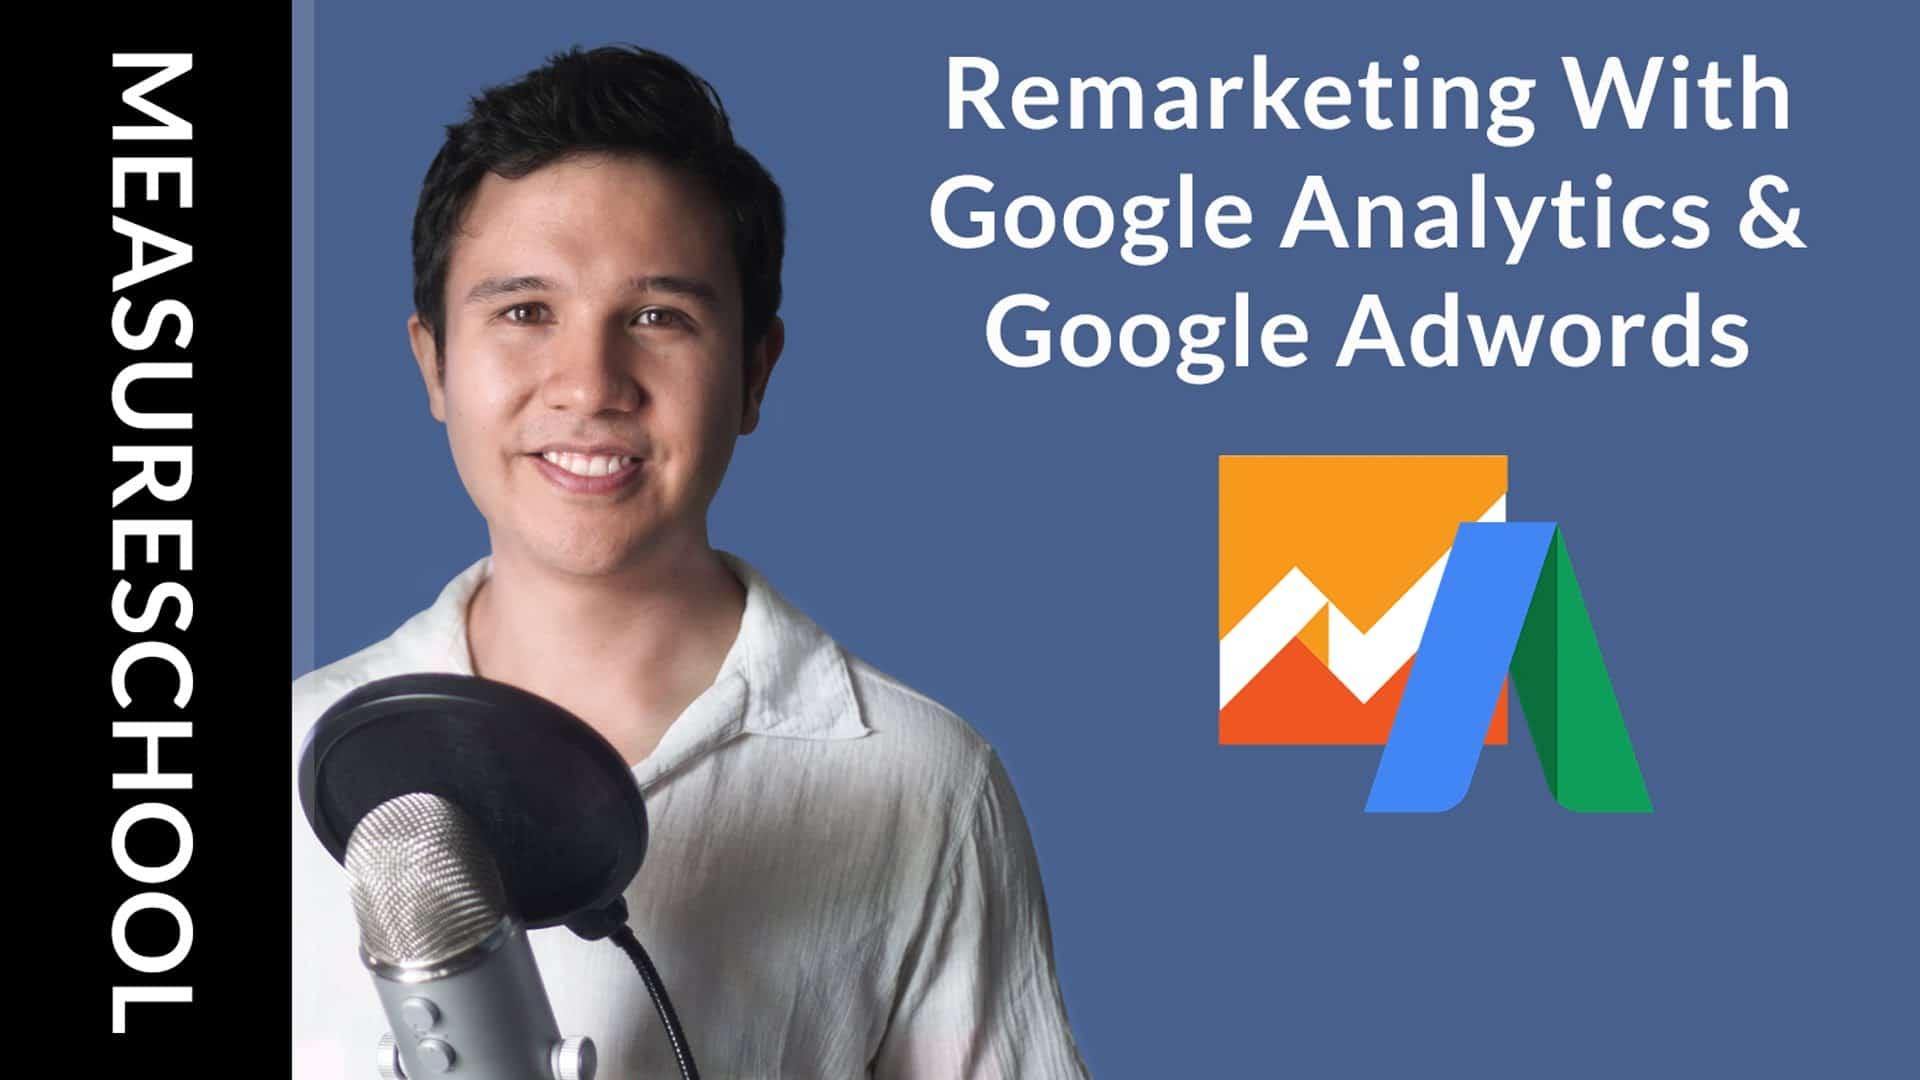 Setting Up Google Adwords Remarketing Audiences with Google Analytics